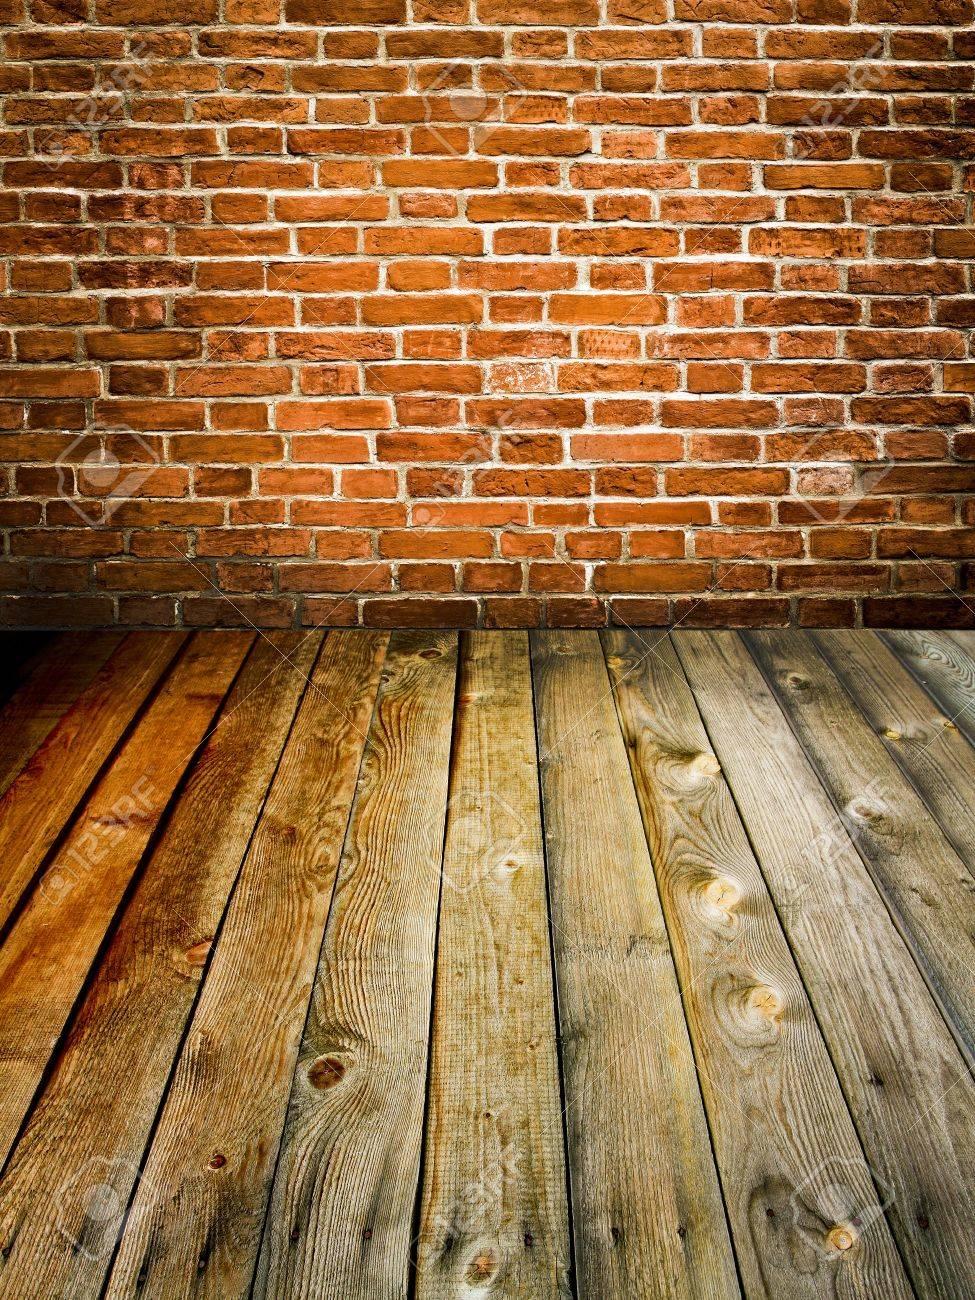 abstract brick wall and wood floor Stock Photo - 9351965